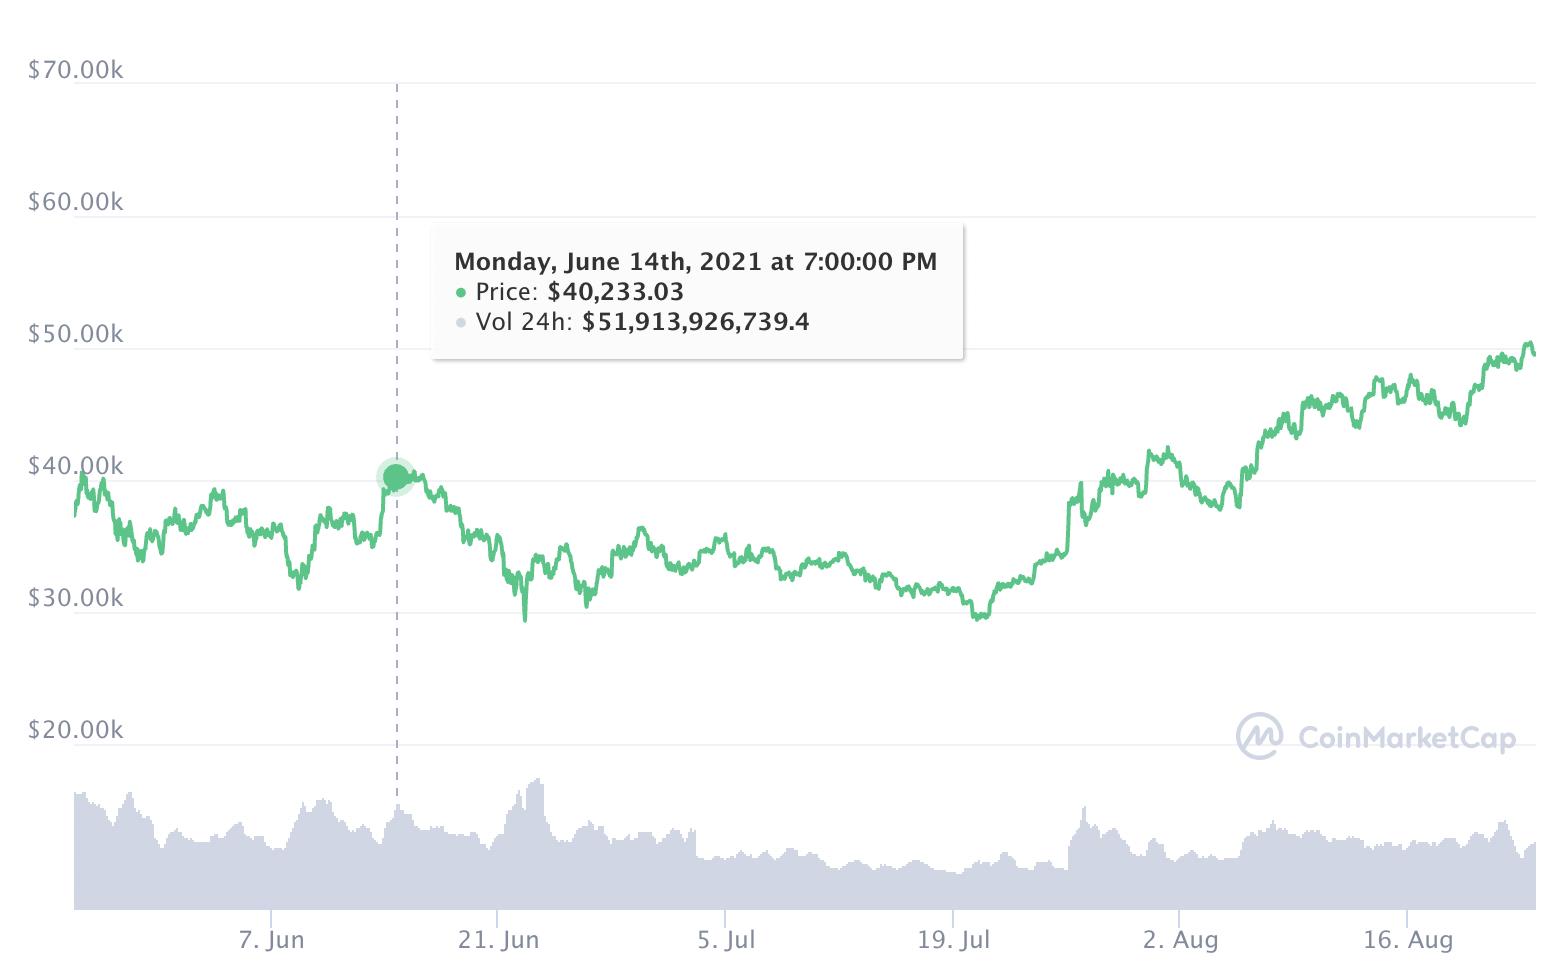 Bitcoin Verlauf 3 Monate